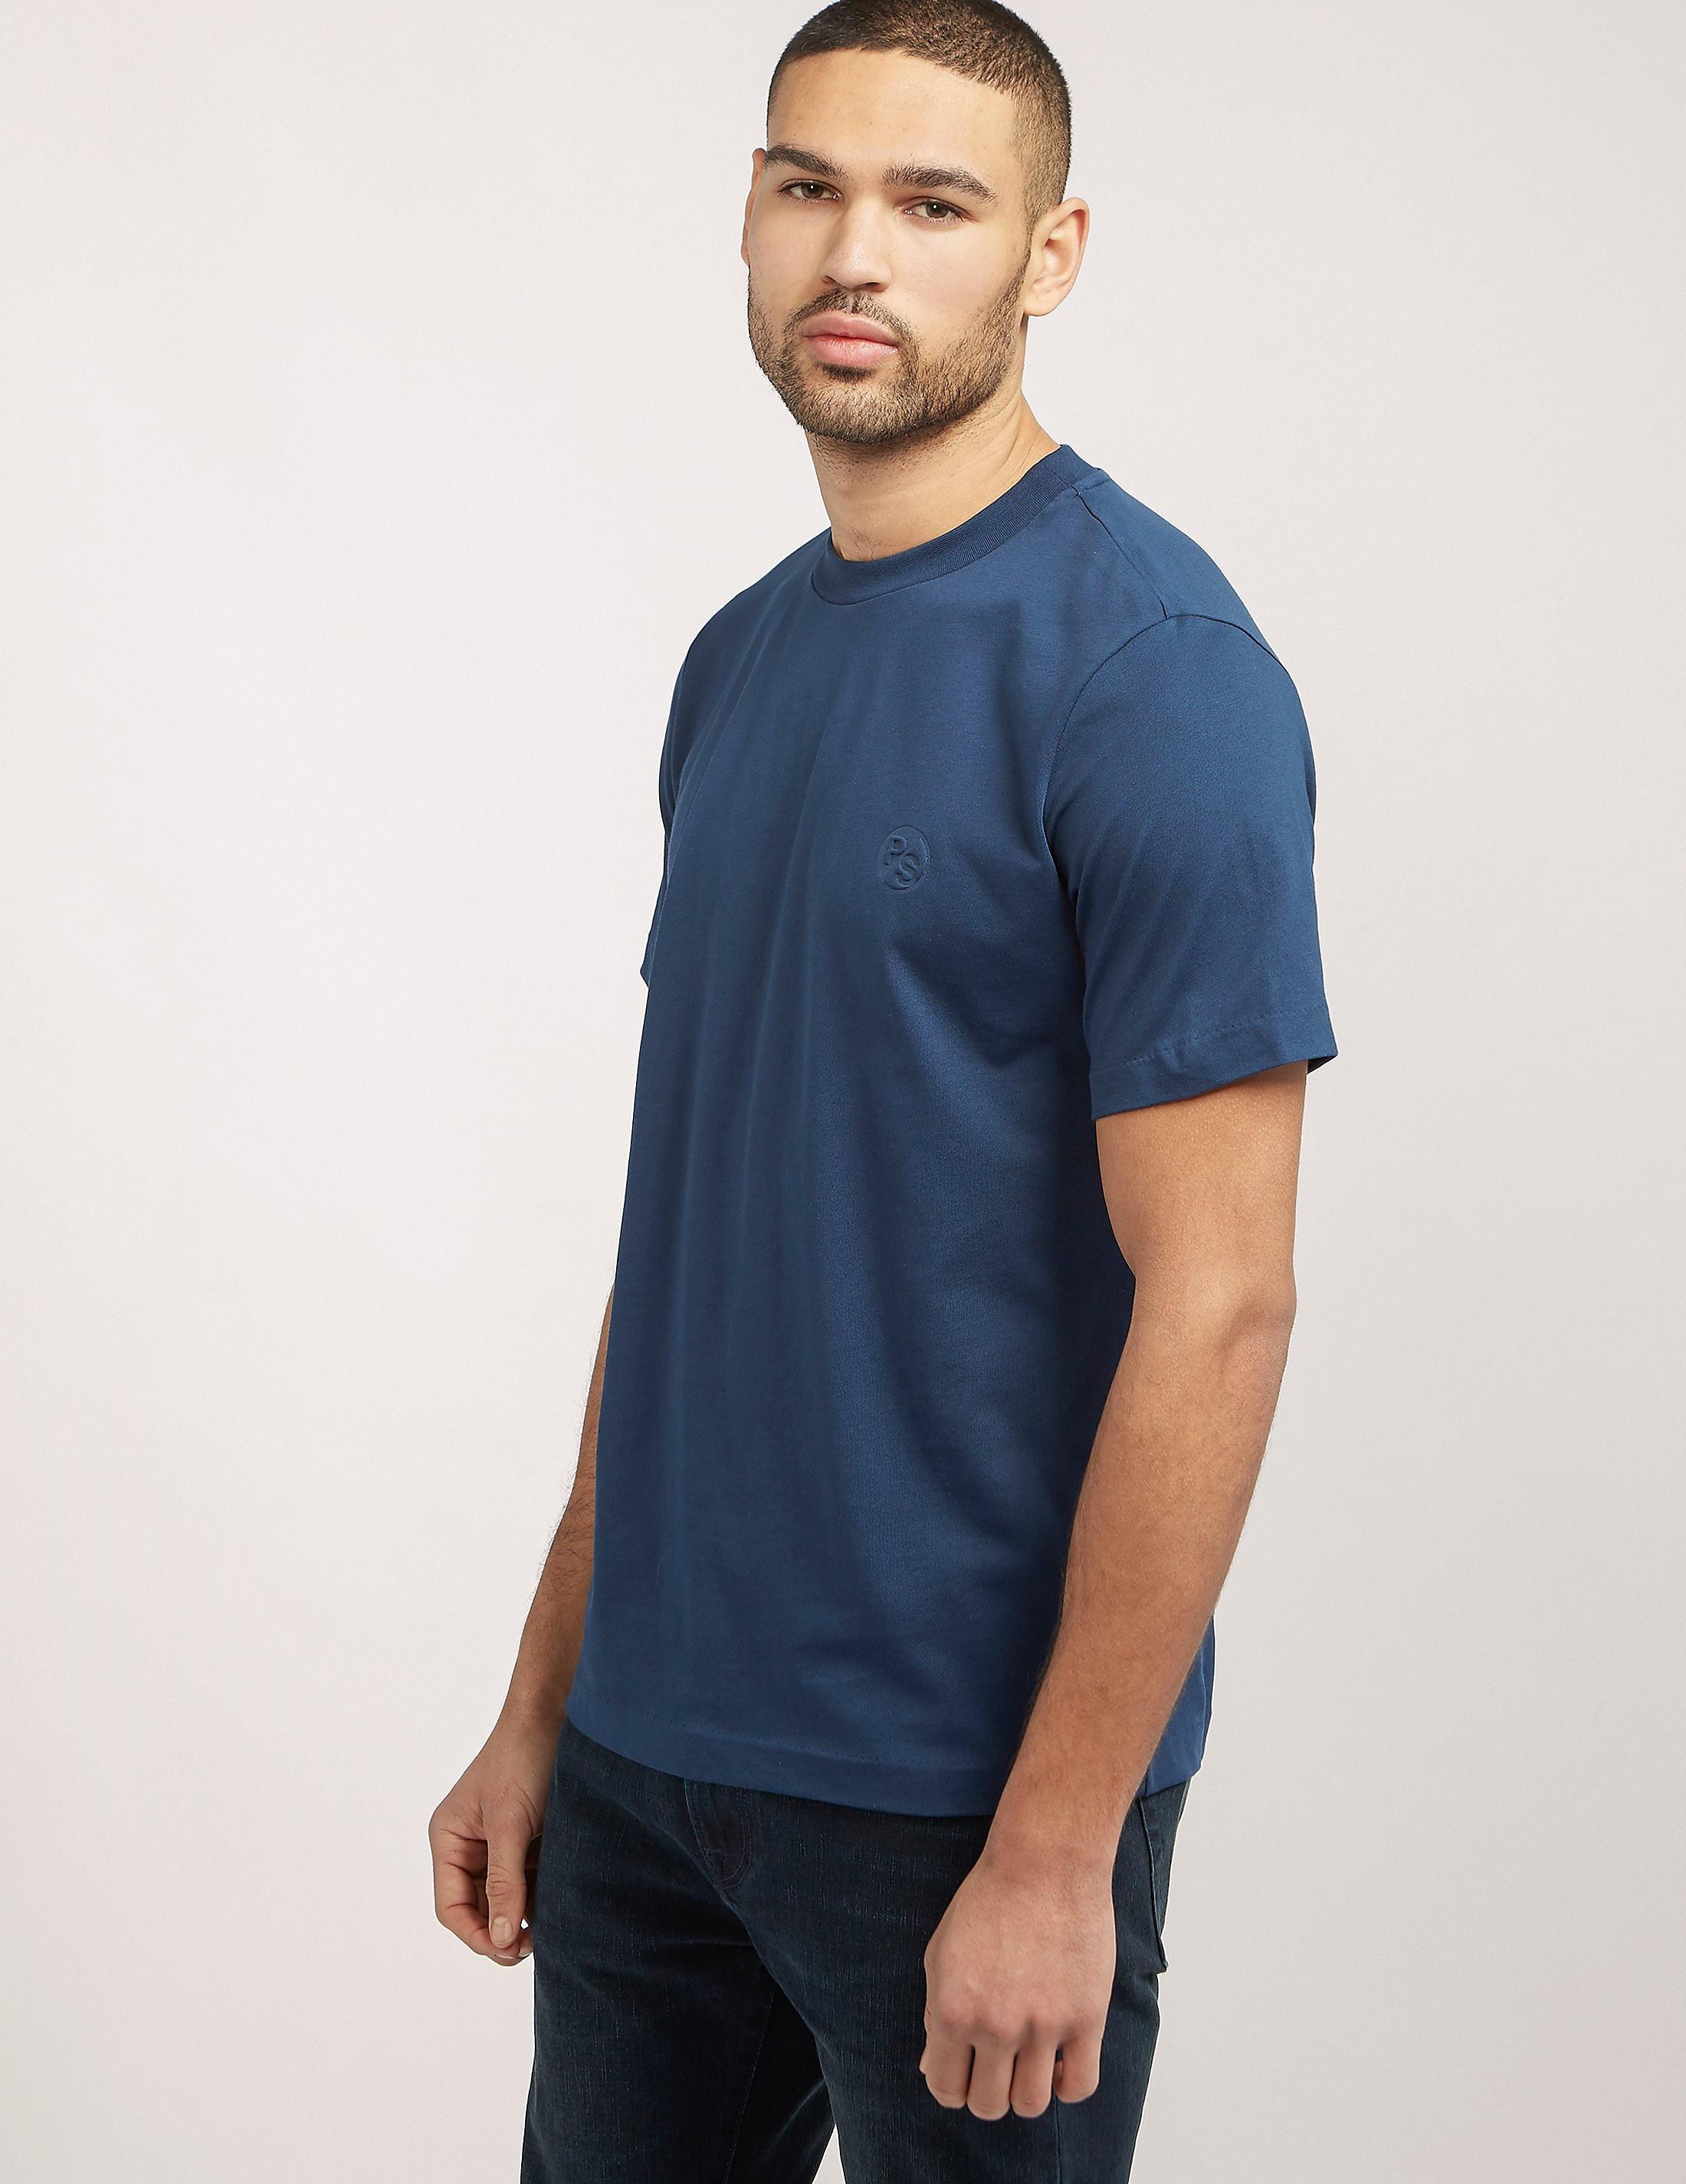 Paul Smith Embossed Logo Supima T-Shirt